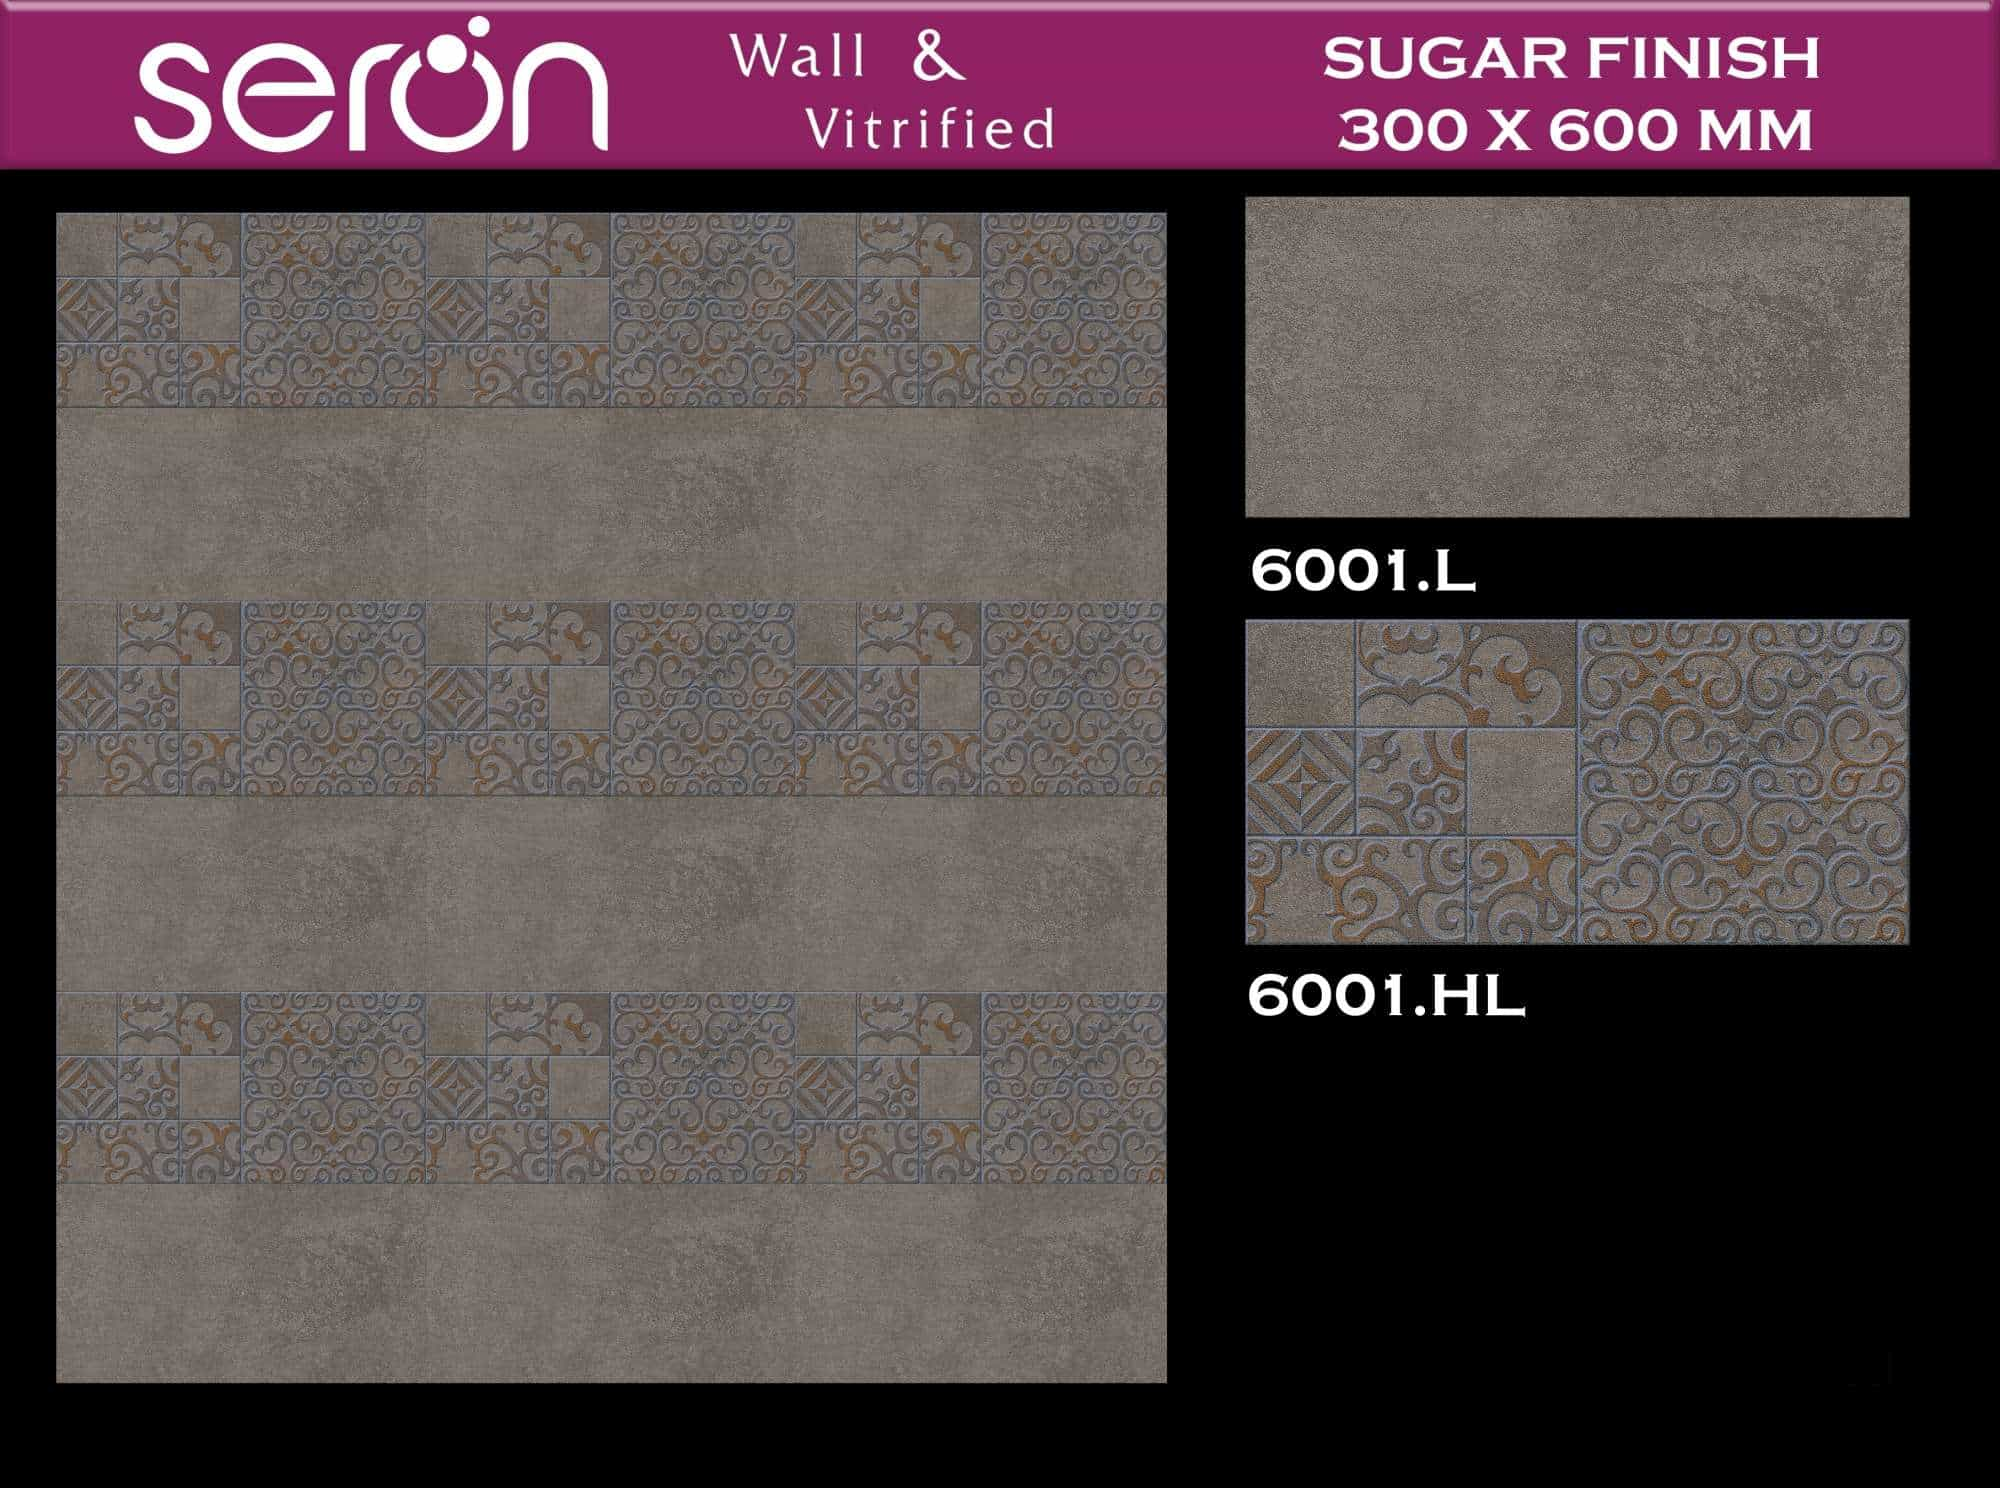 Seron ceramics pvtd morbi ppw tile manufacturers in morbi seron ceramics pvtd morbi ppw tile manufacturers in morbi justdial dailygadgetfo Images